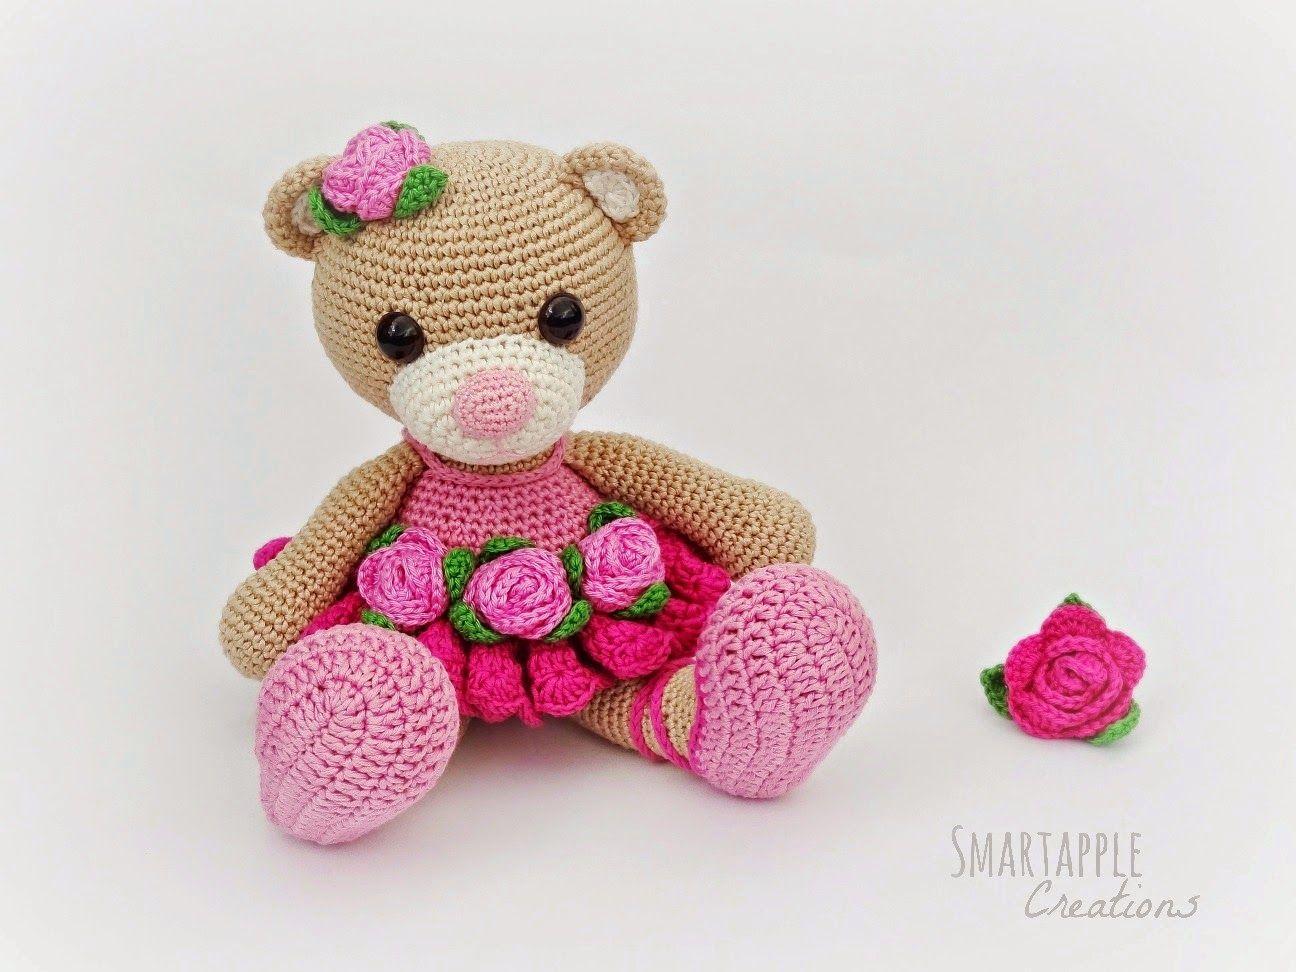 Smartapple Creations - amigurumi and crochet: Bibi the Ballerina ...